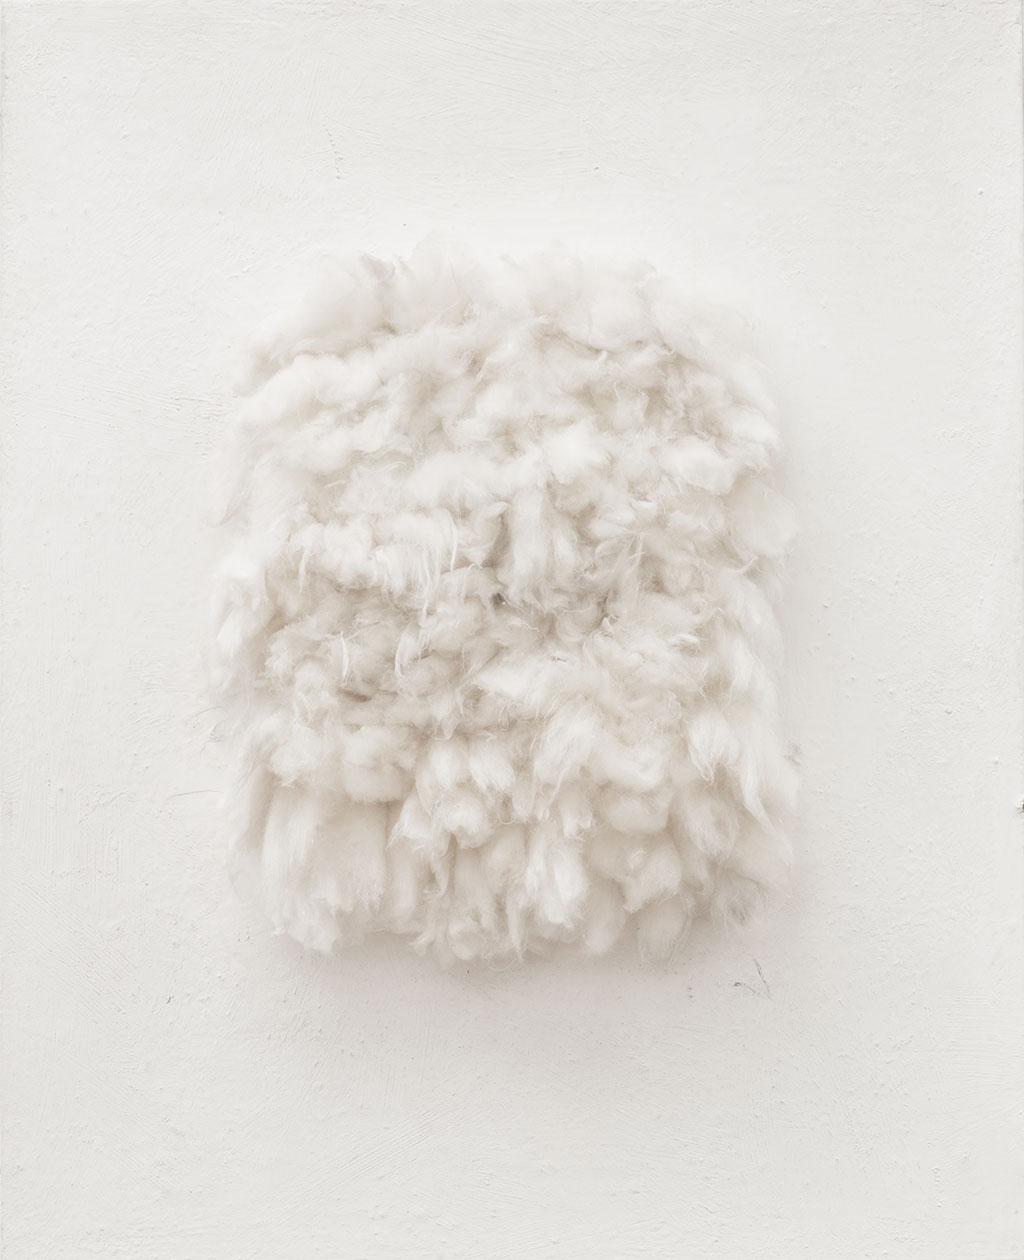 Piero Manzoni (1933 – 1963) Achrome, 1959-62 Ahşap üzerine pamuk 92 x 73 x 12 cm Özel Koleksiyon